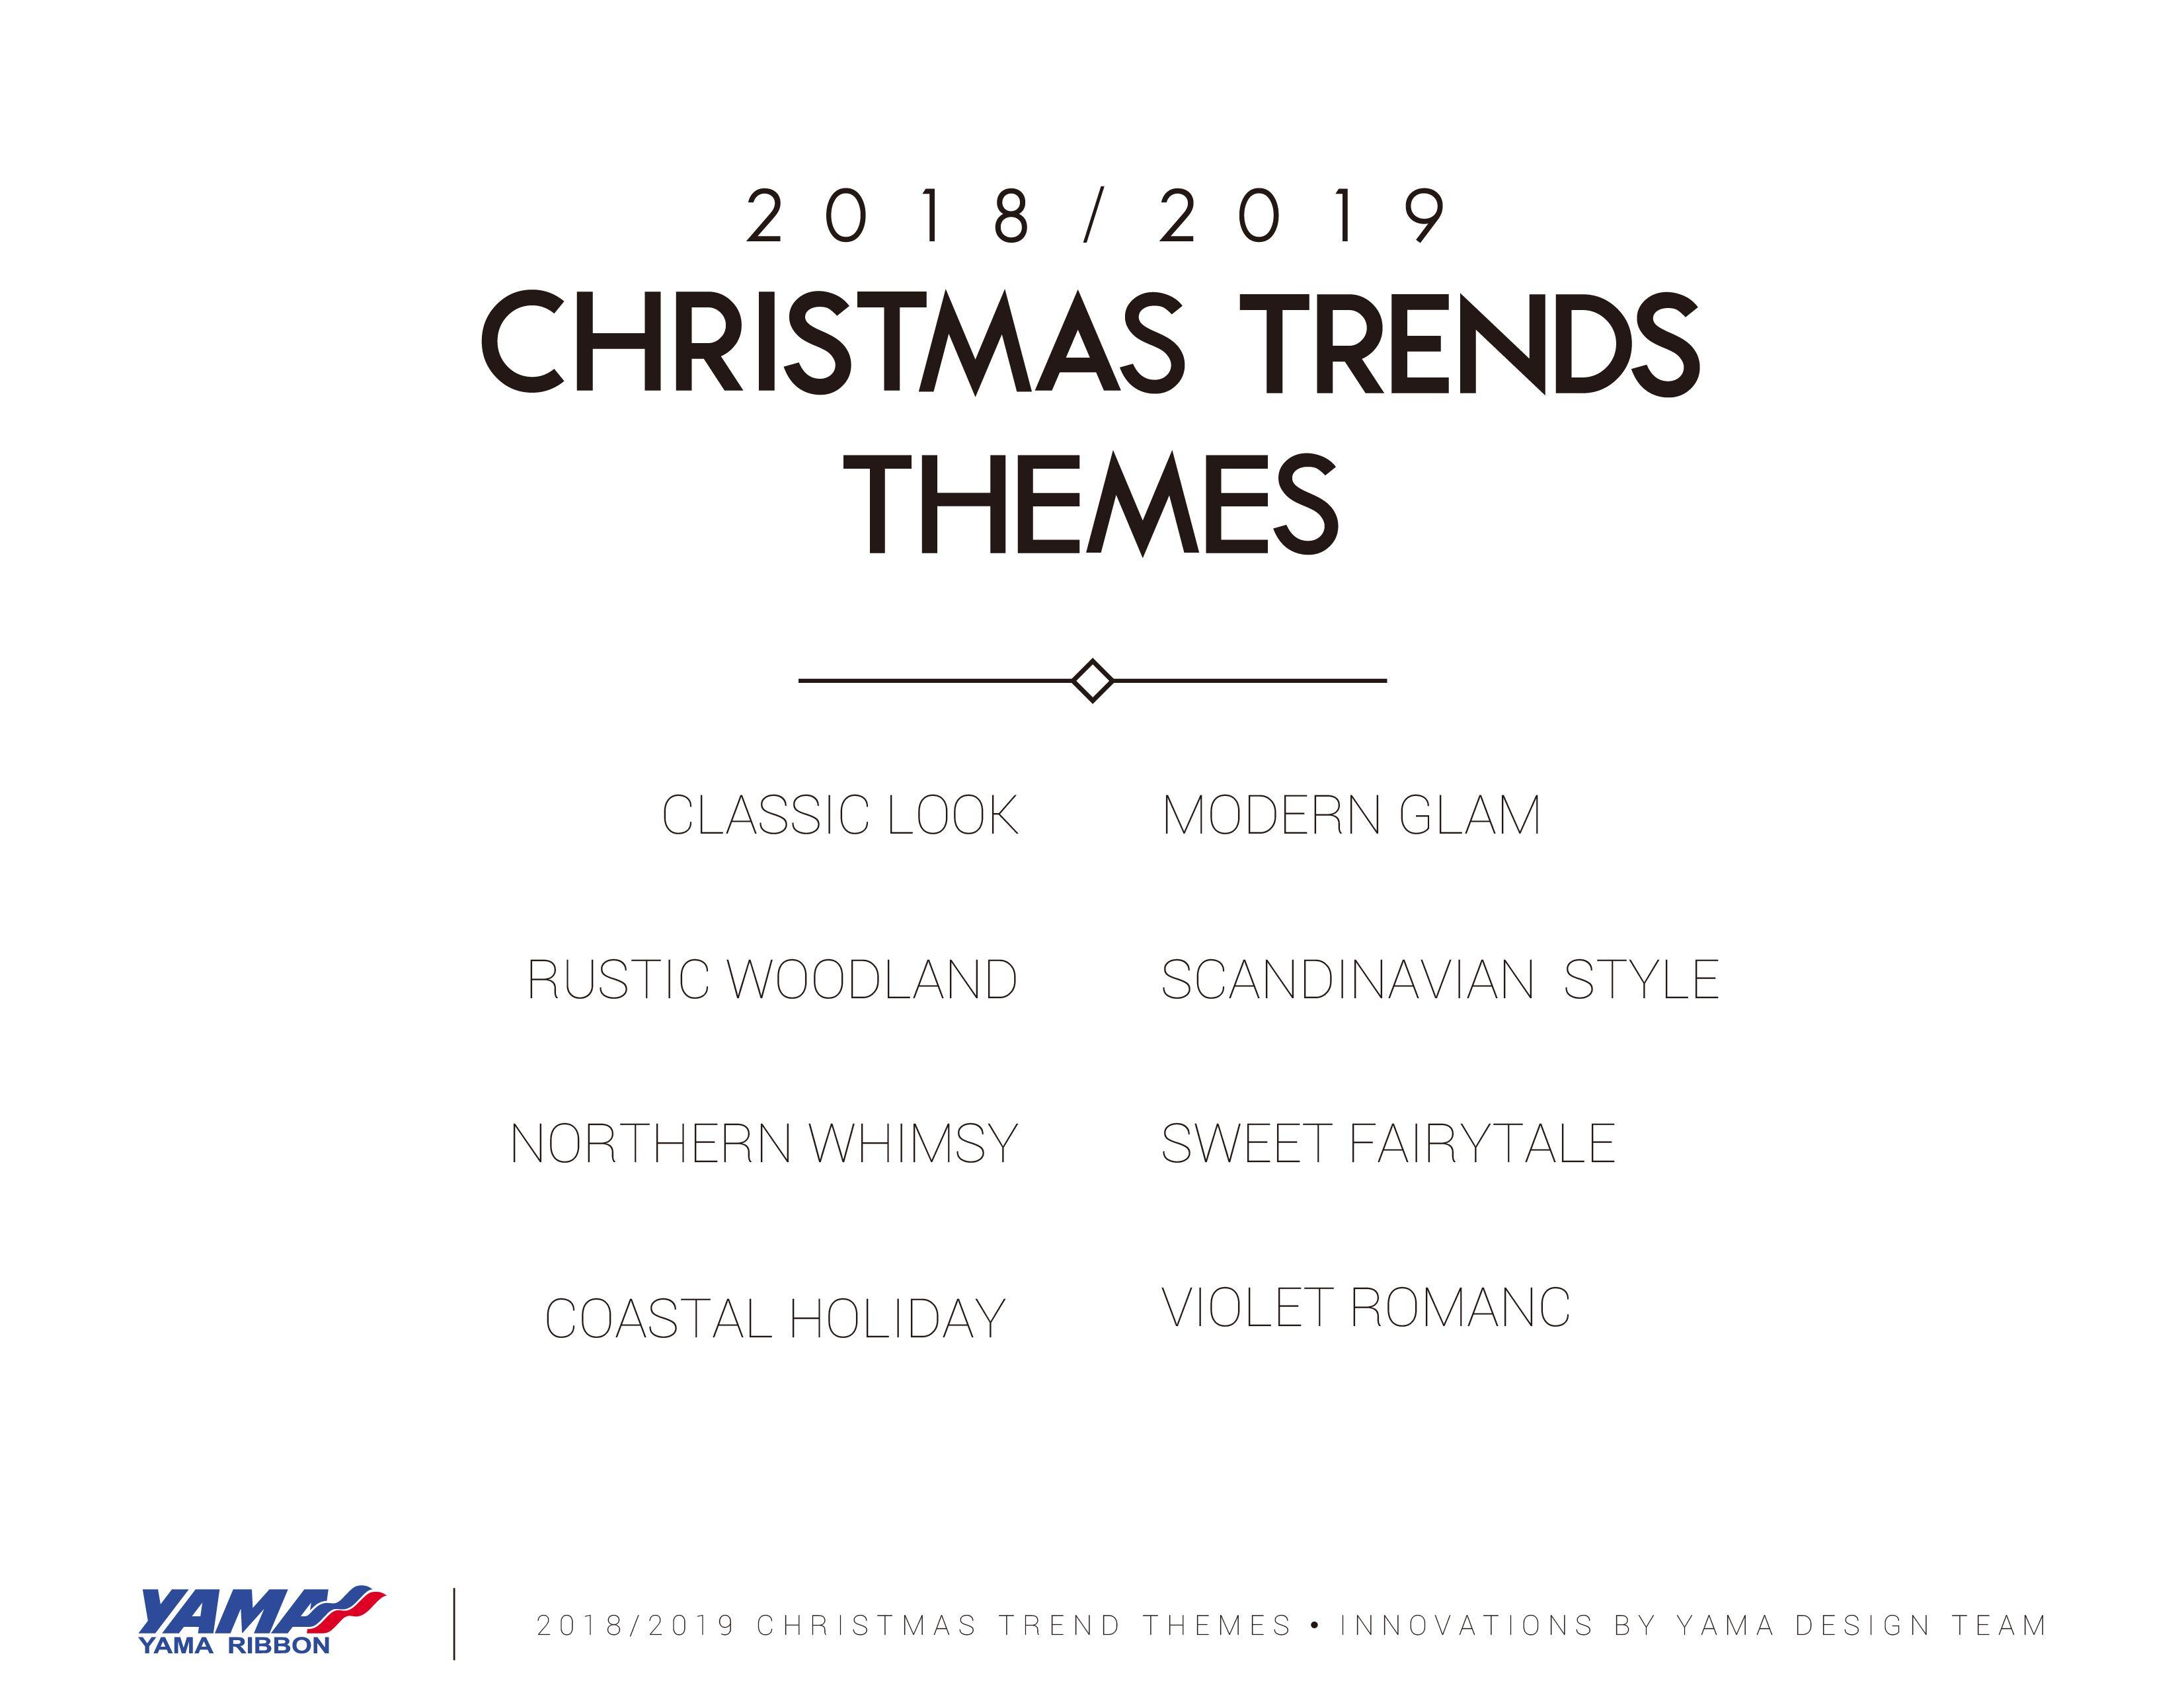 Holiday Christmas Trends 2019.2018 2019 Yama Christmas Trends Christmas Trends